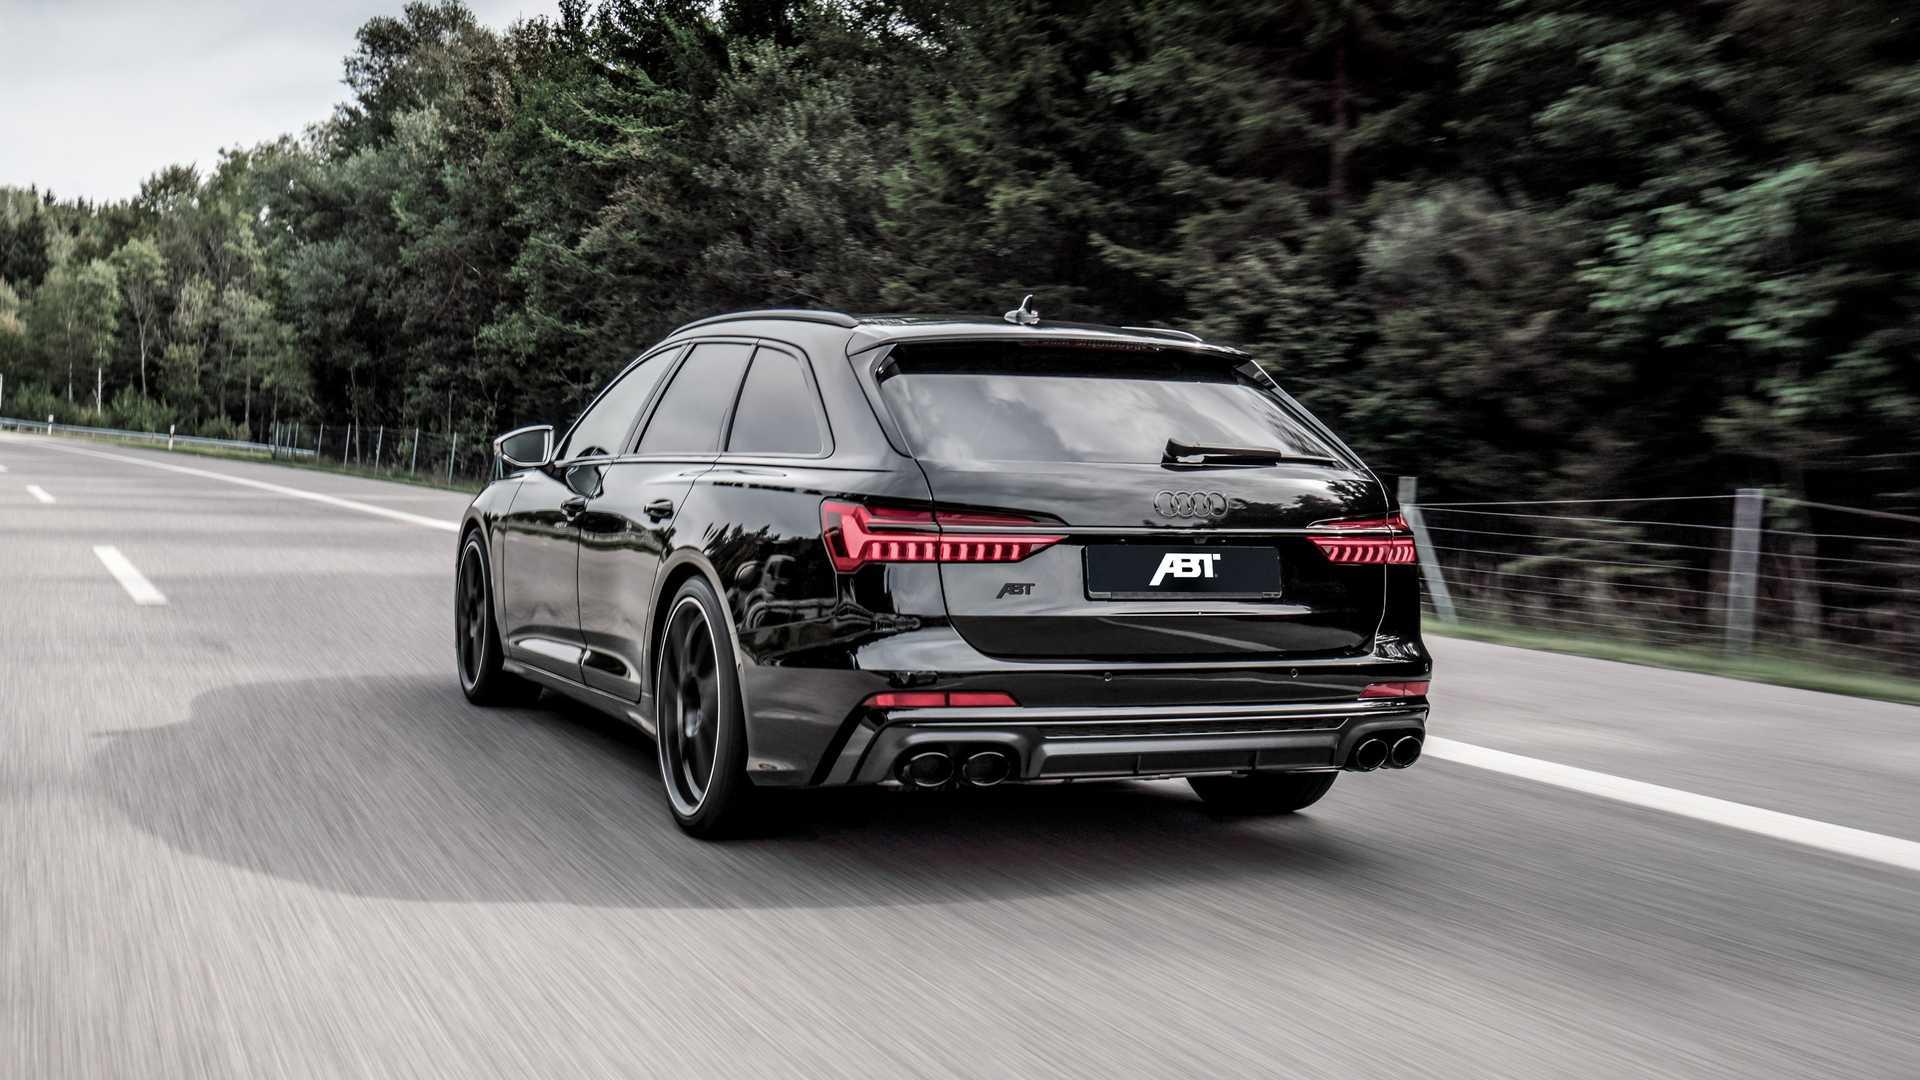 2020_Audi_S6_Avant_TDI_by_ABT_0002